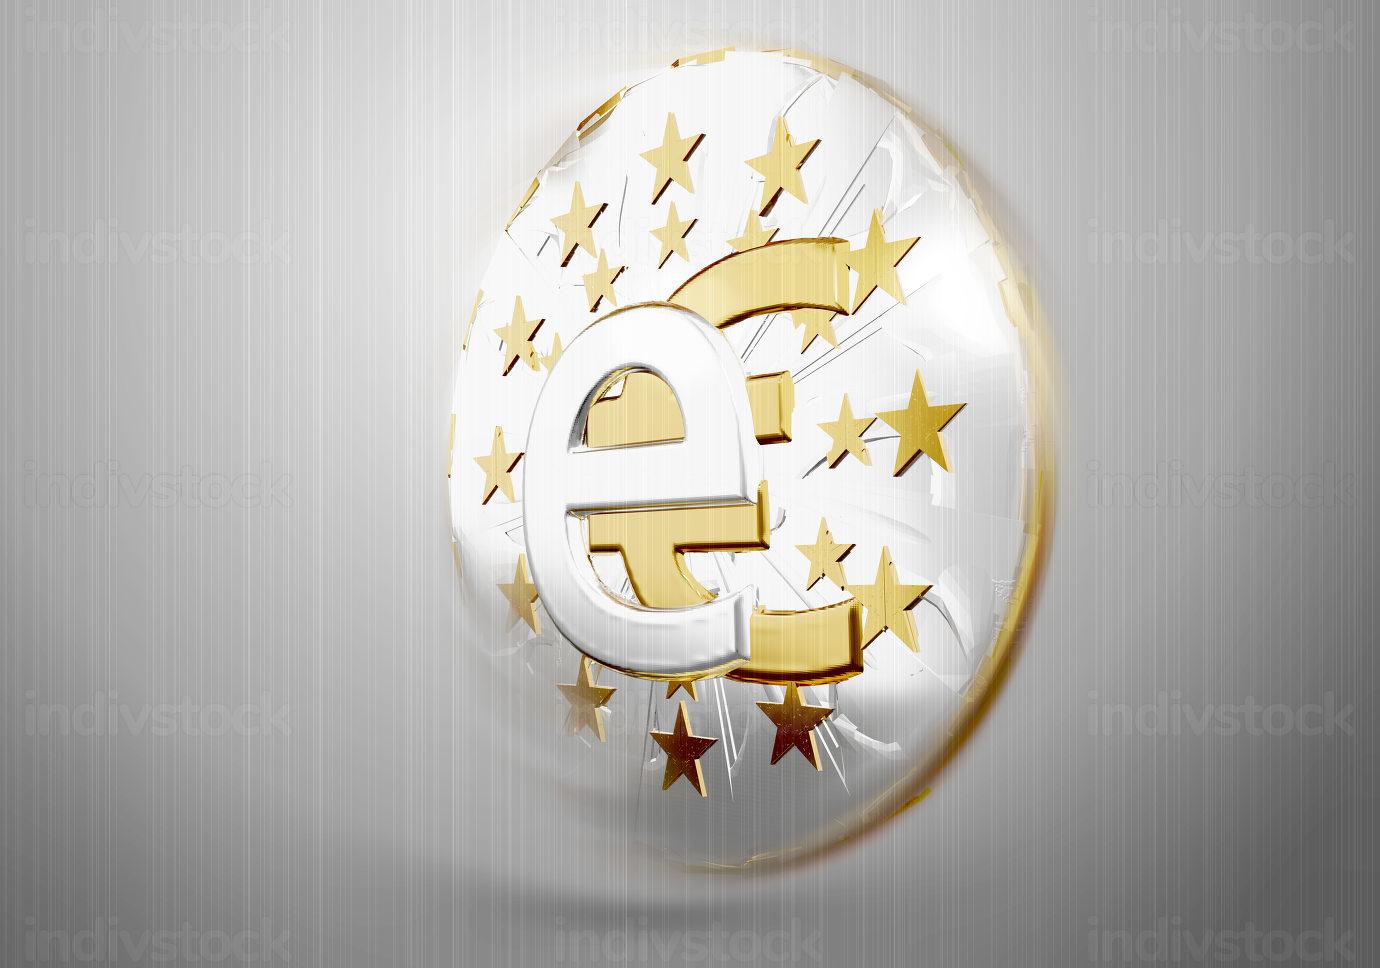 digital currency e-euro golden symbol metallic 3d-illustration